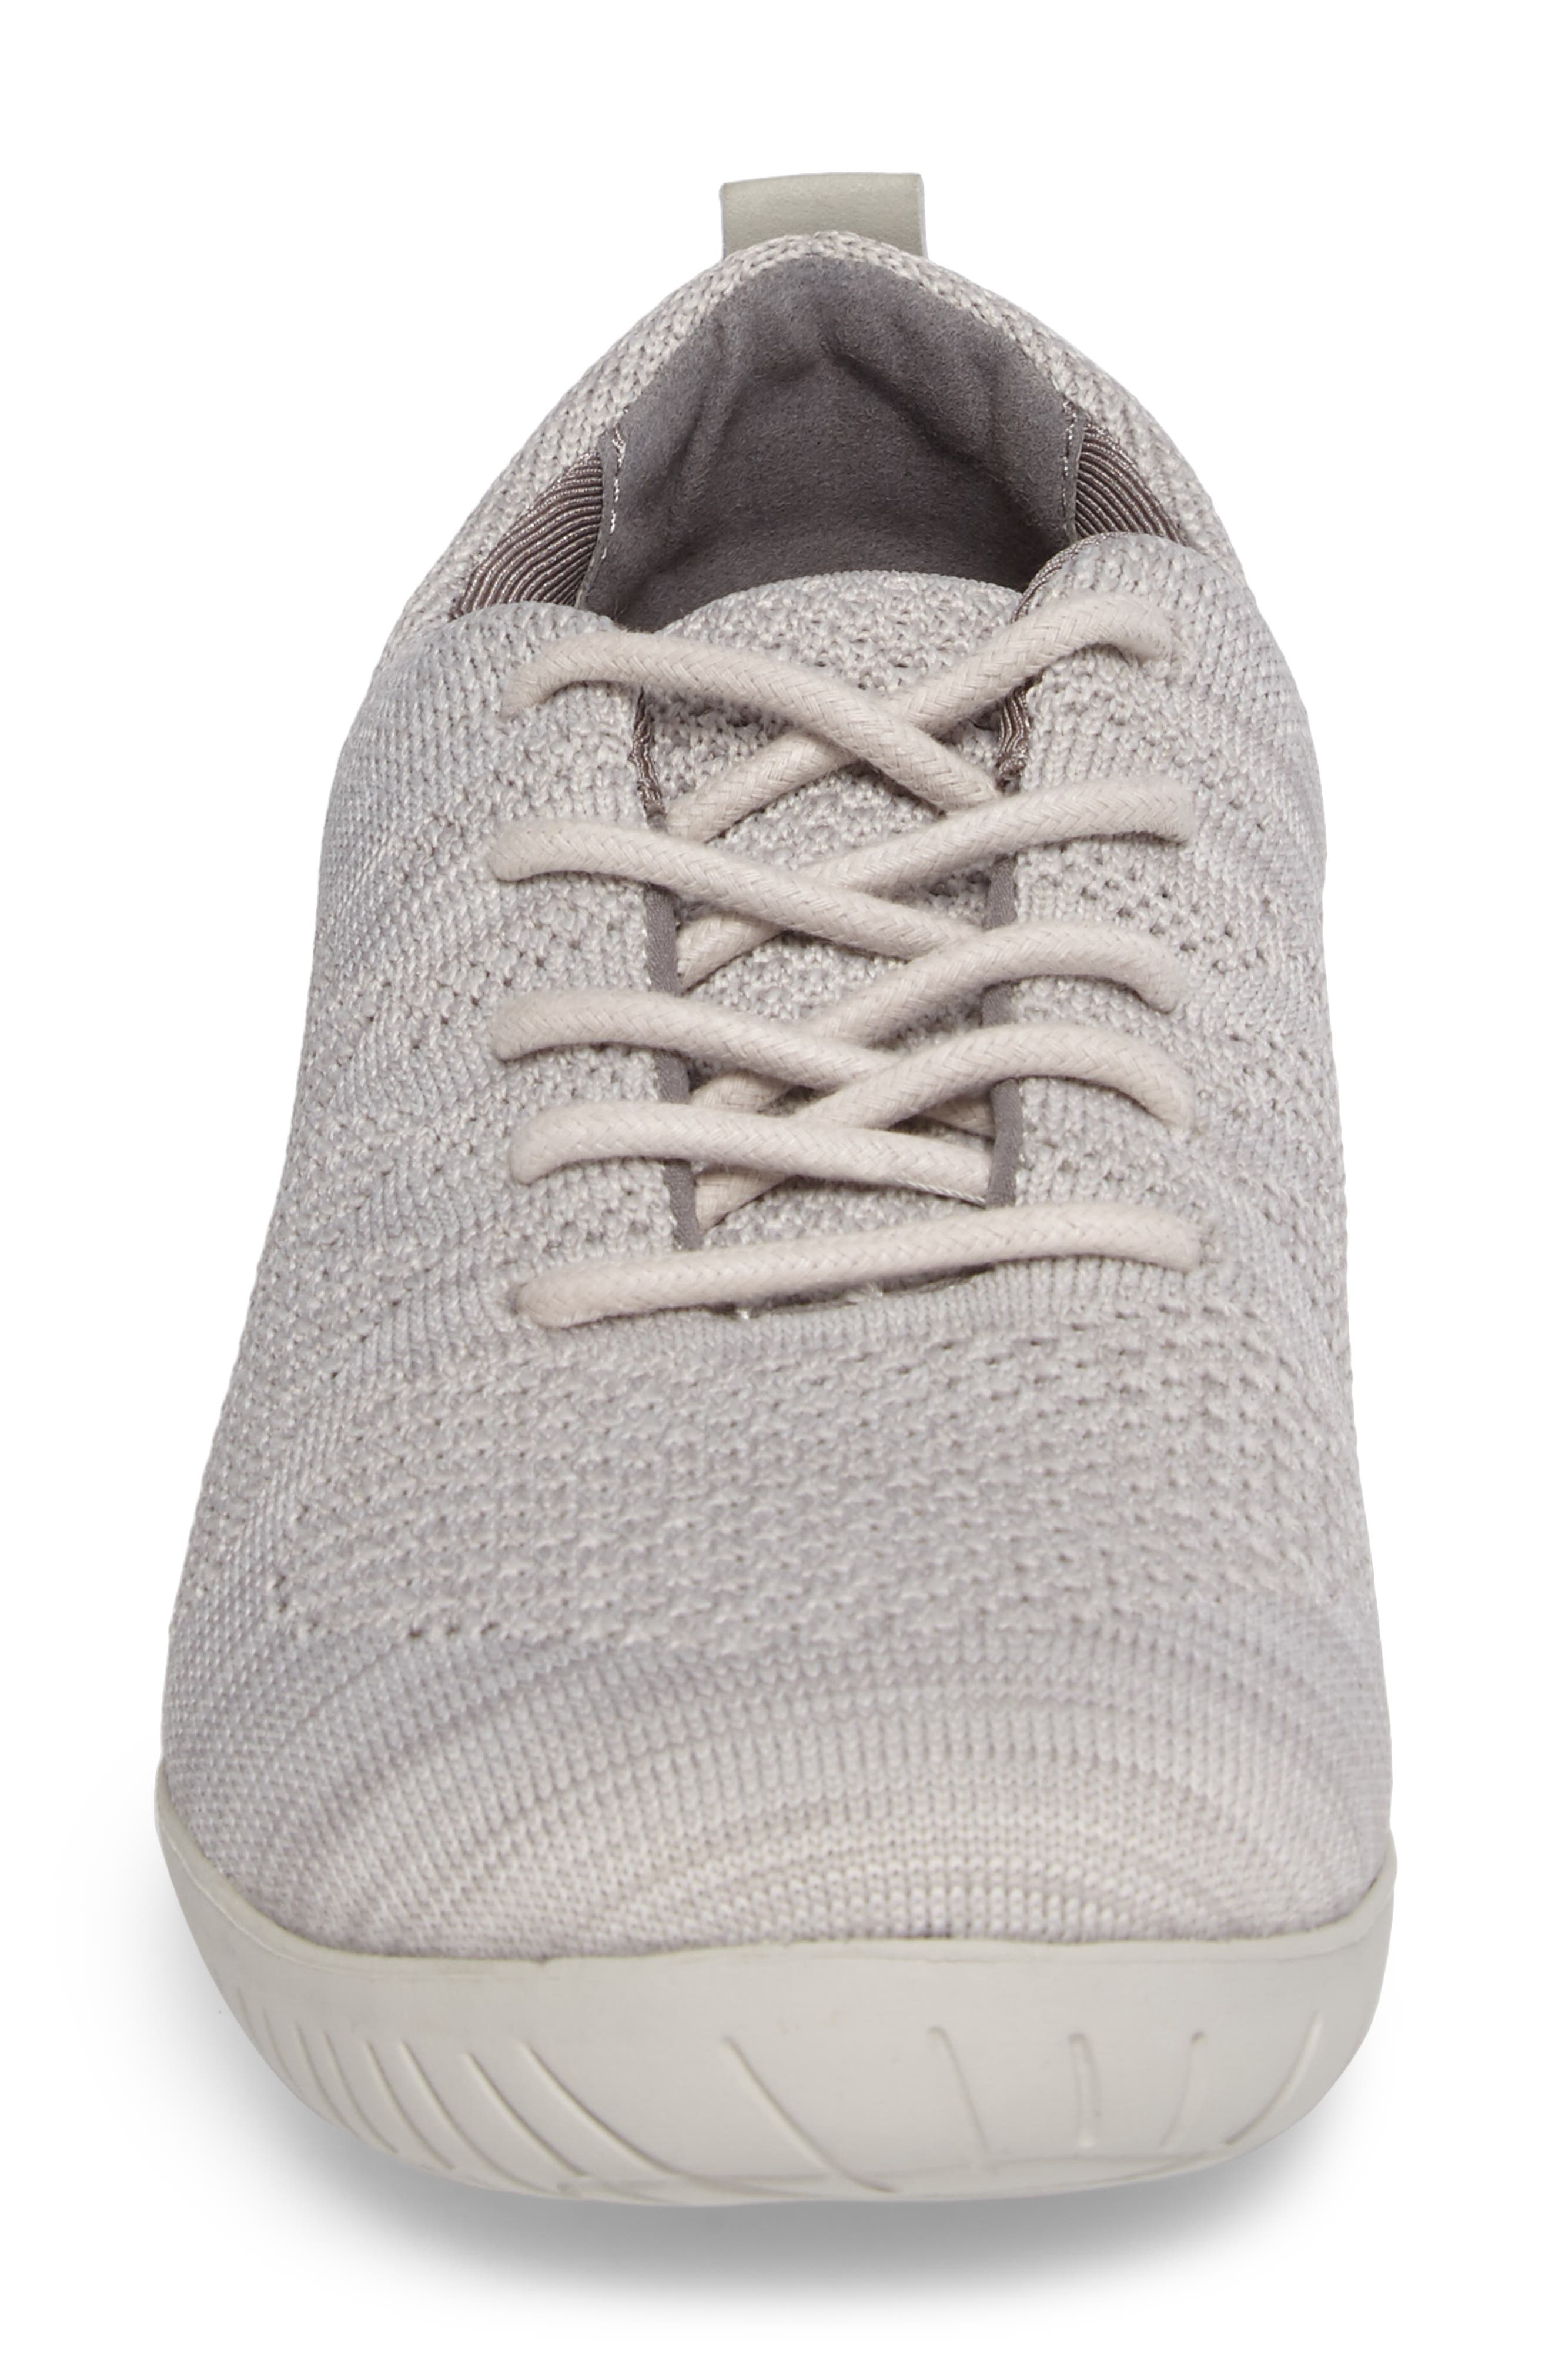 Raelyn Knit Sneaker,                             Alternate thumbnail 4, color,                             Cloud Fabric